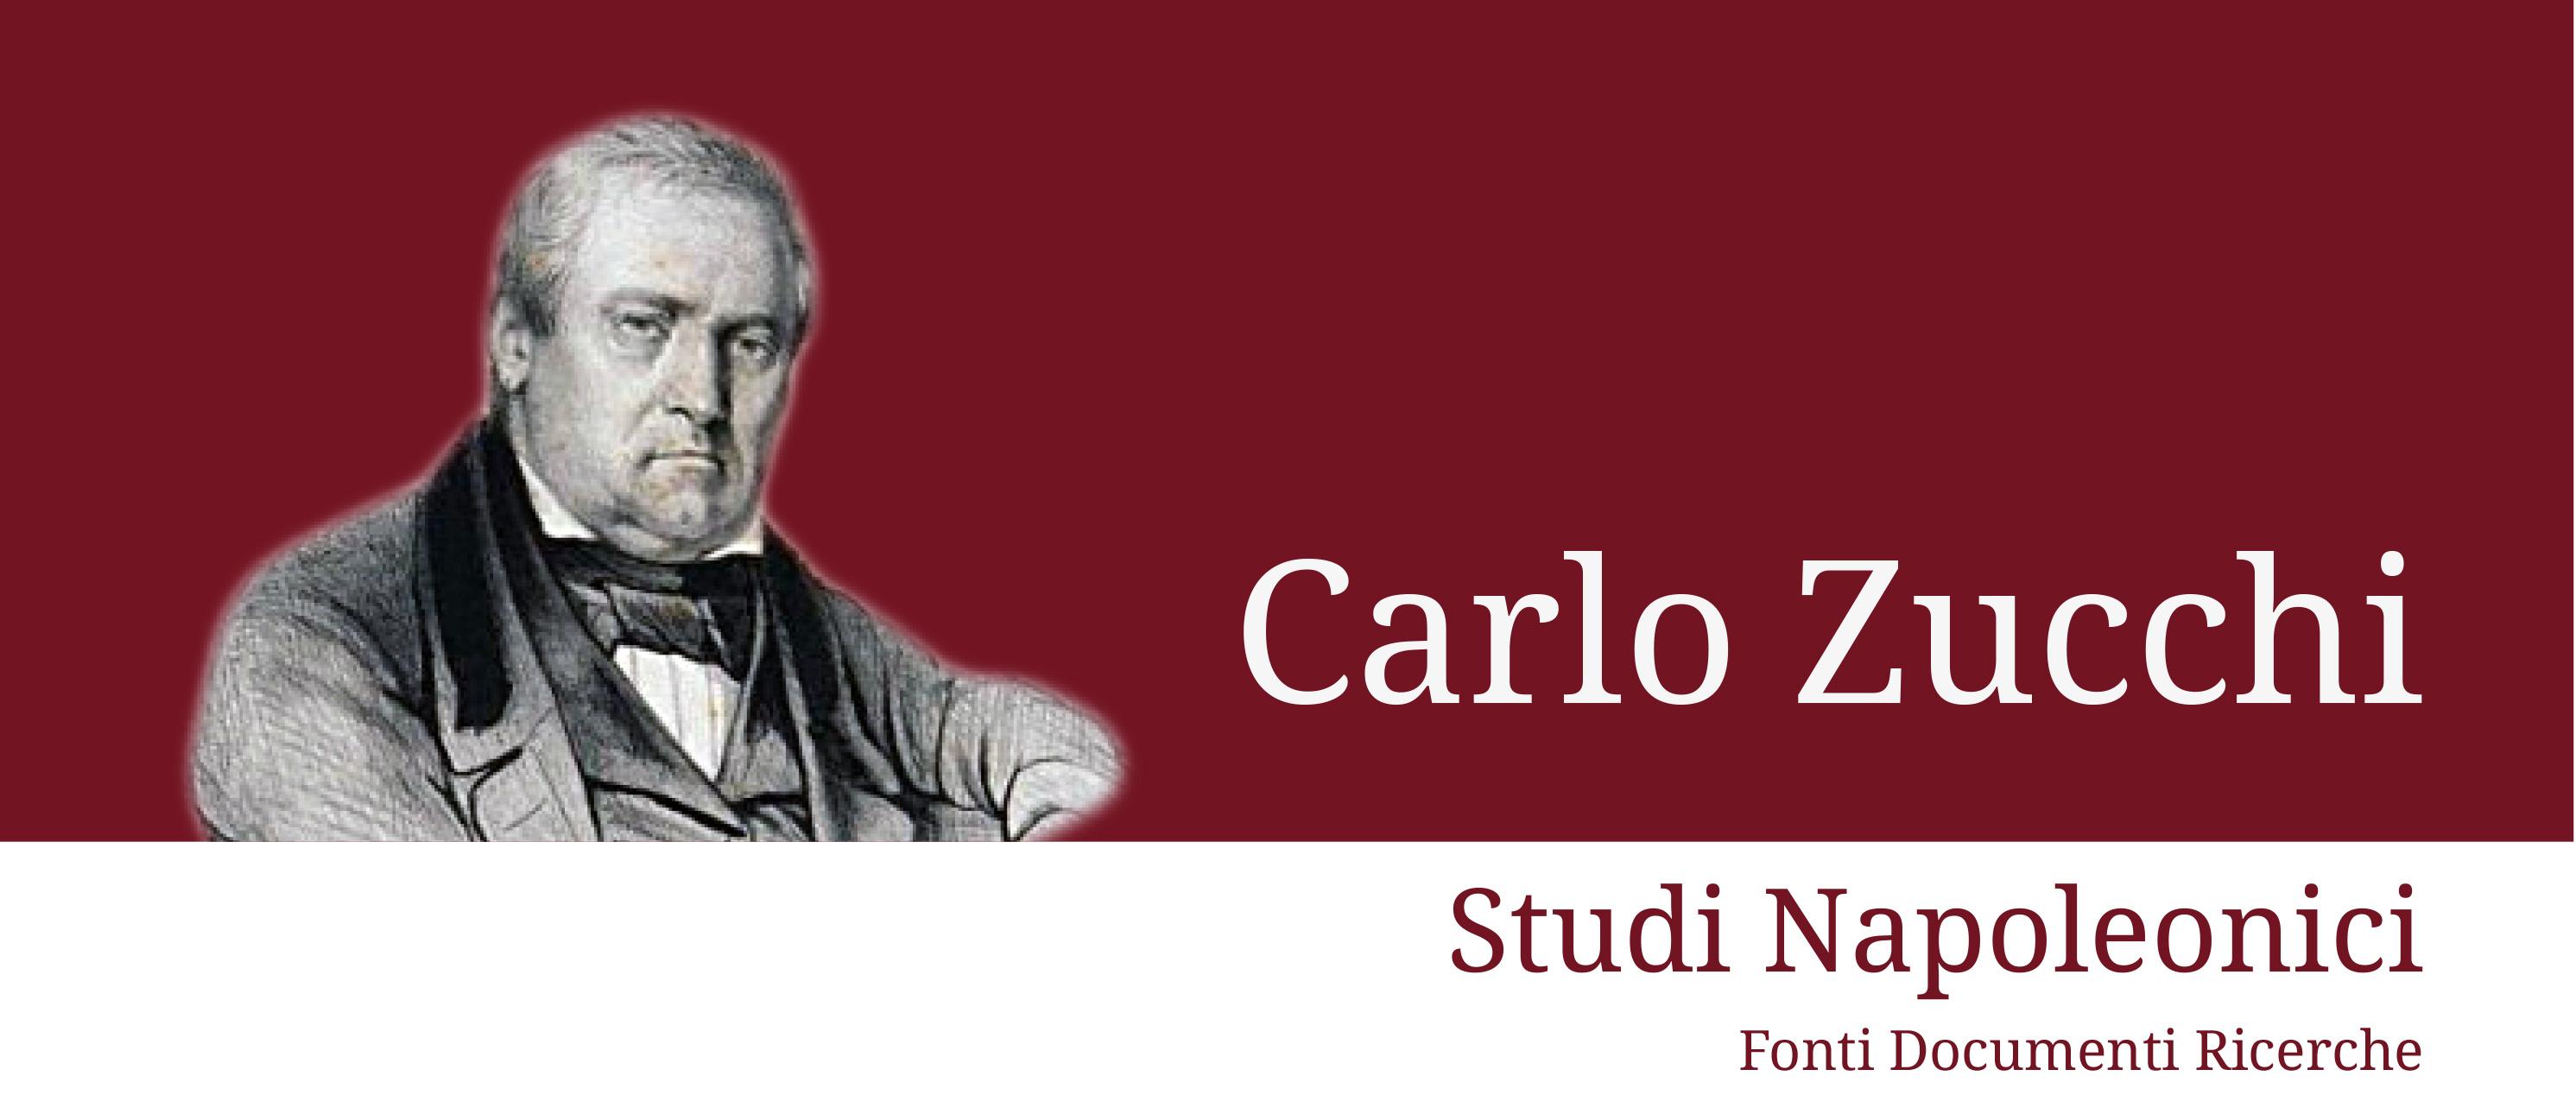 Carlo Zucchi